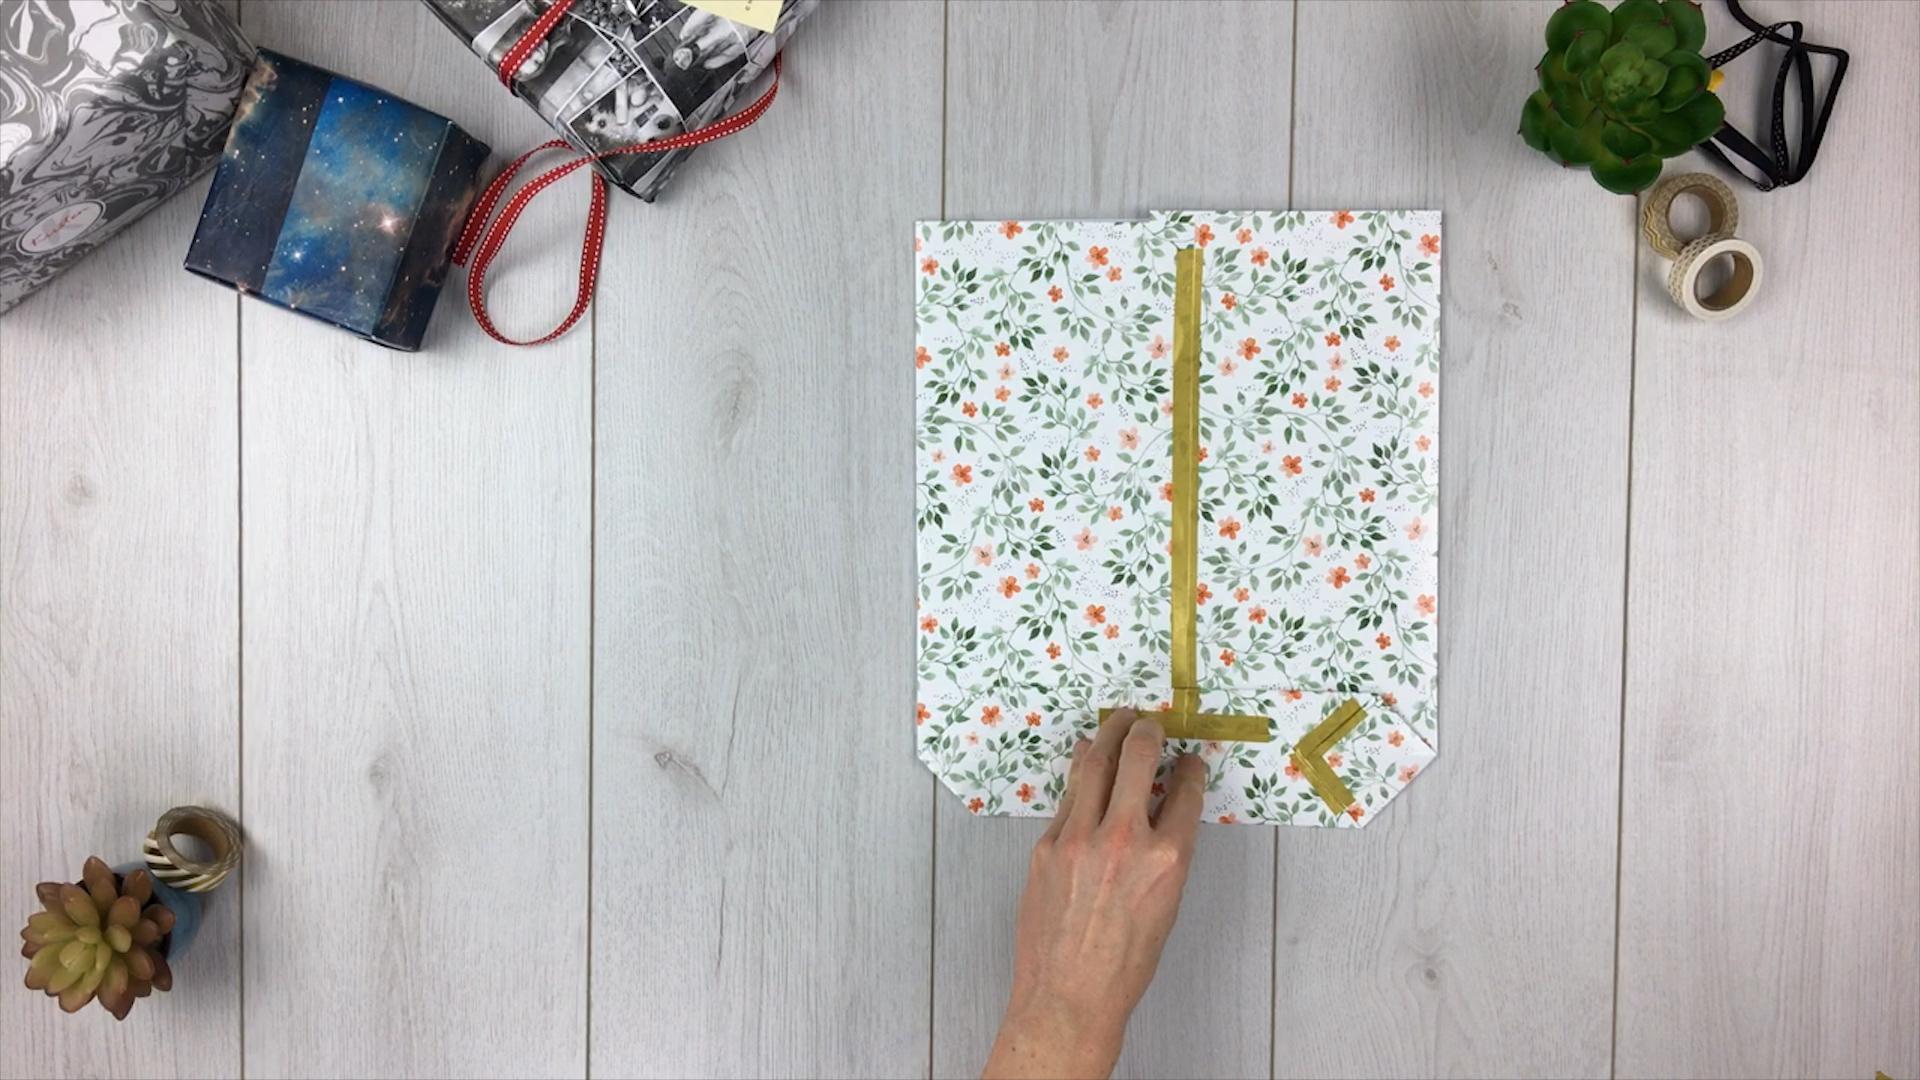 Geschenktüte basteln - Schritt 6